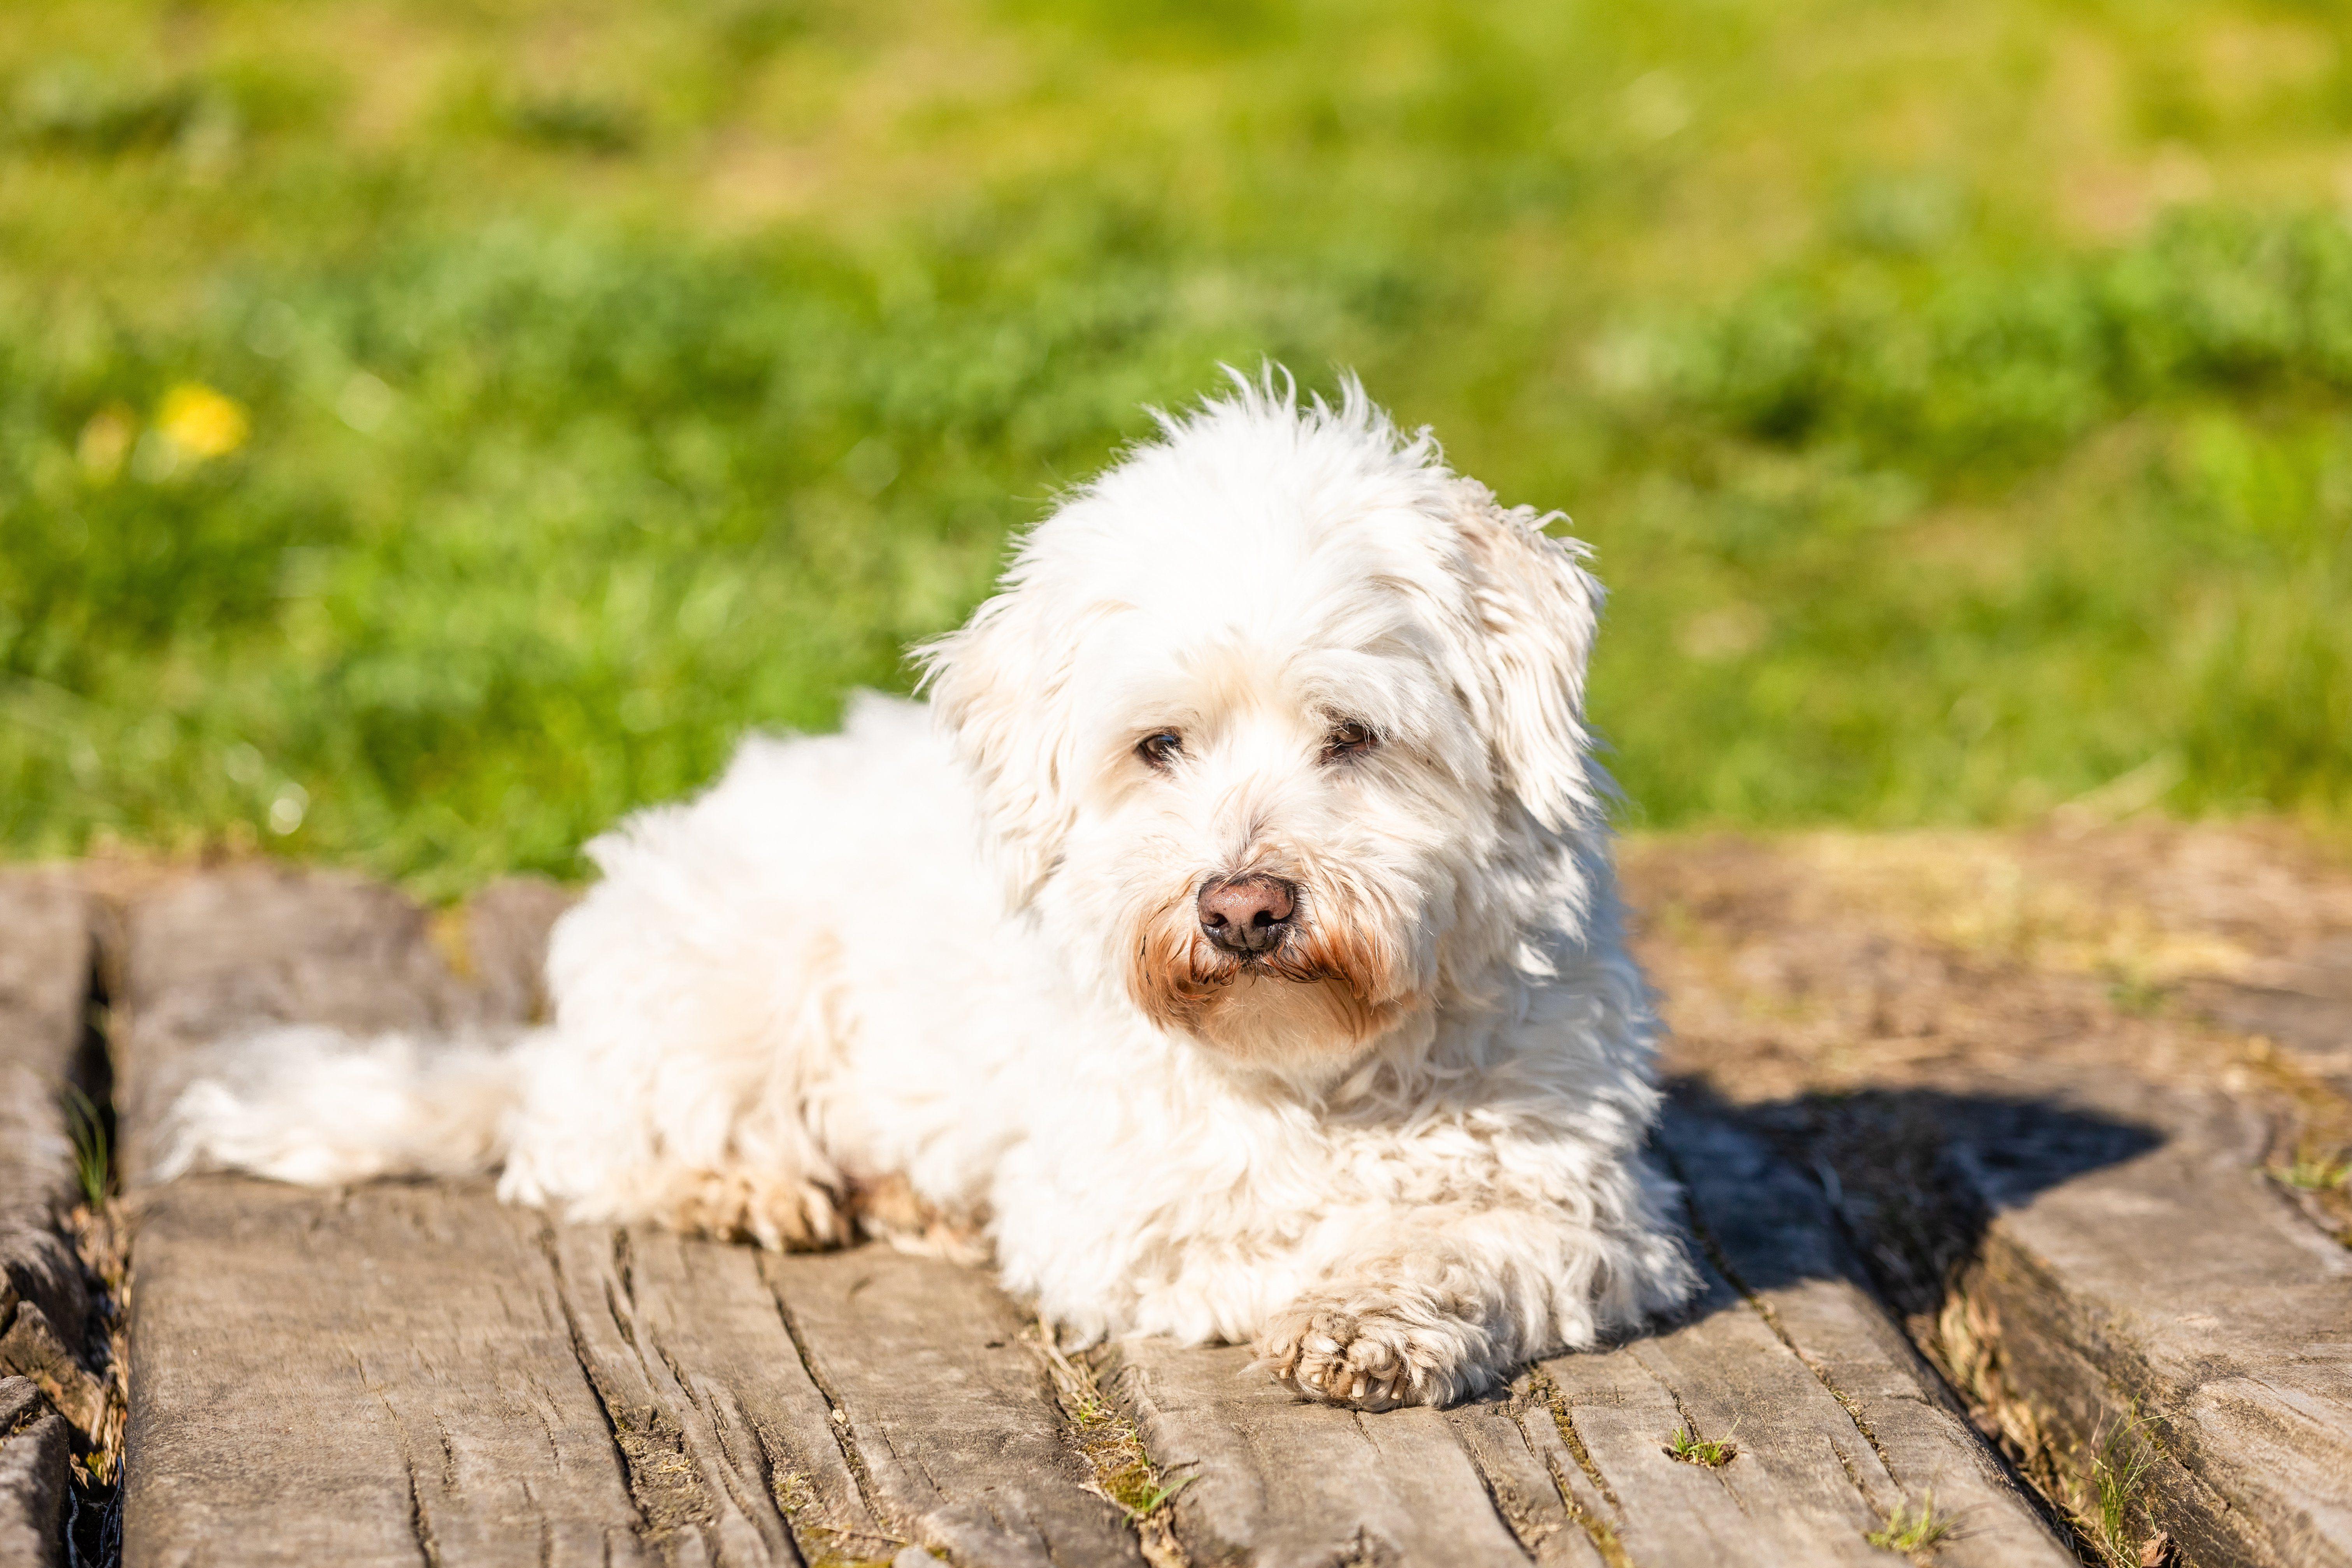 Coton de Tulear dog lying outdoors in the sun